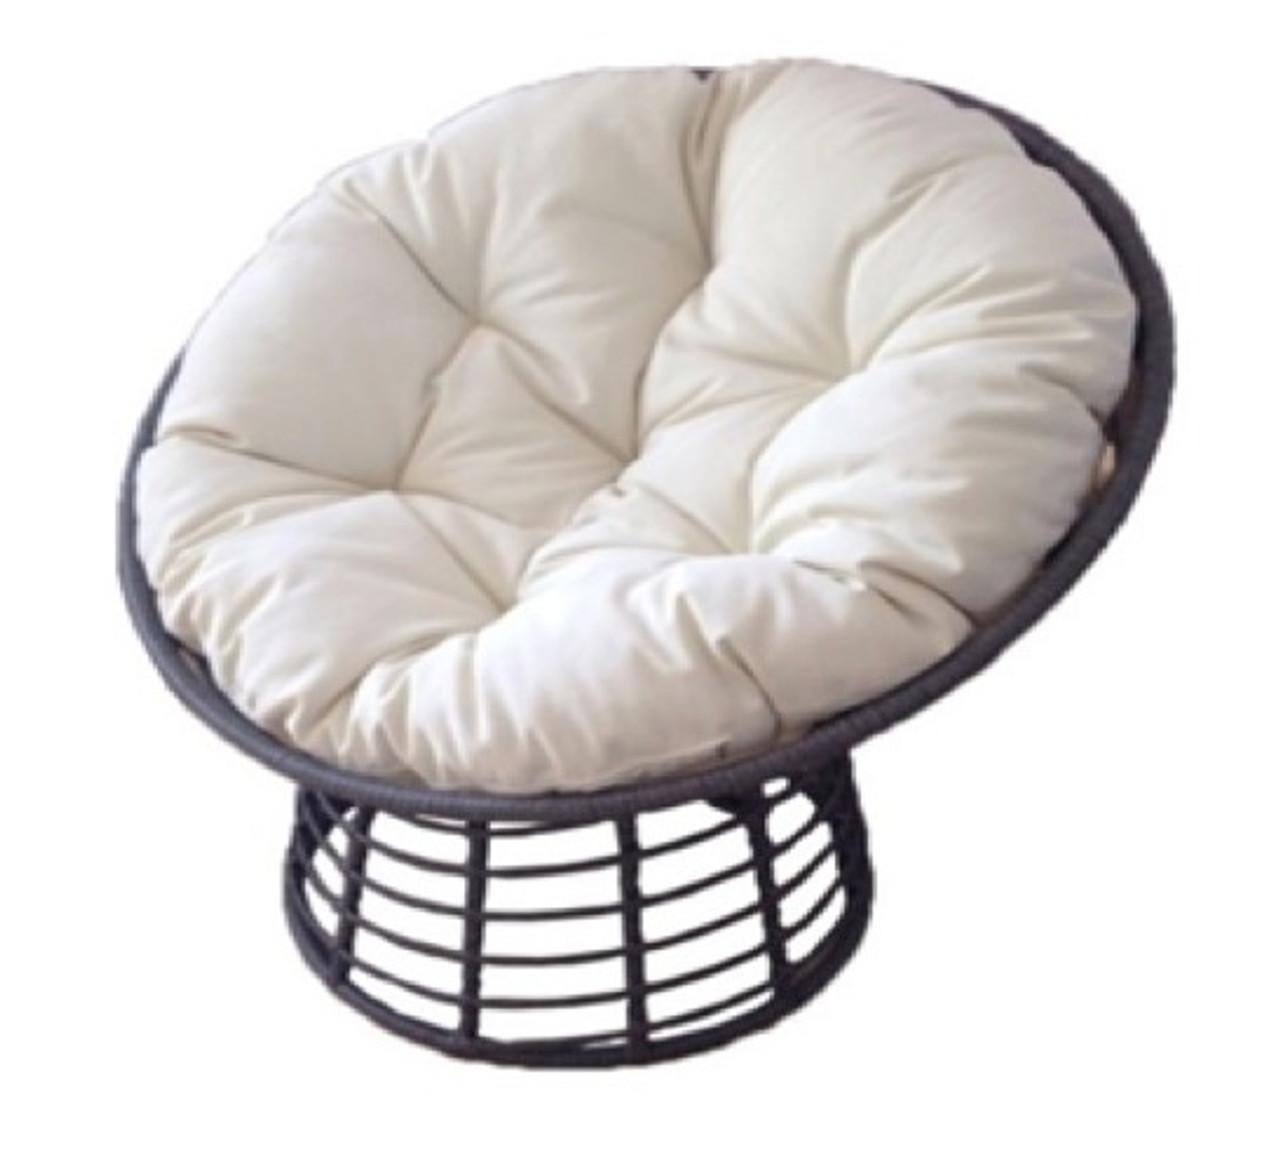 SupaGarden Swivel Rattan Chair